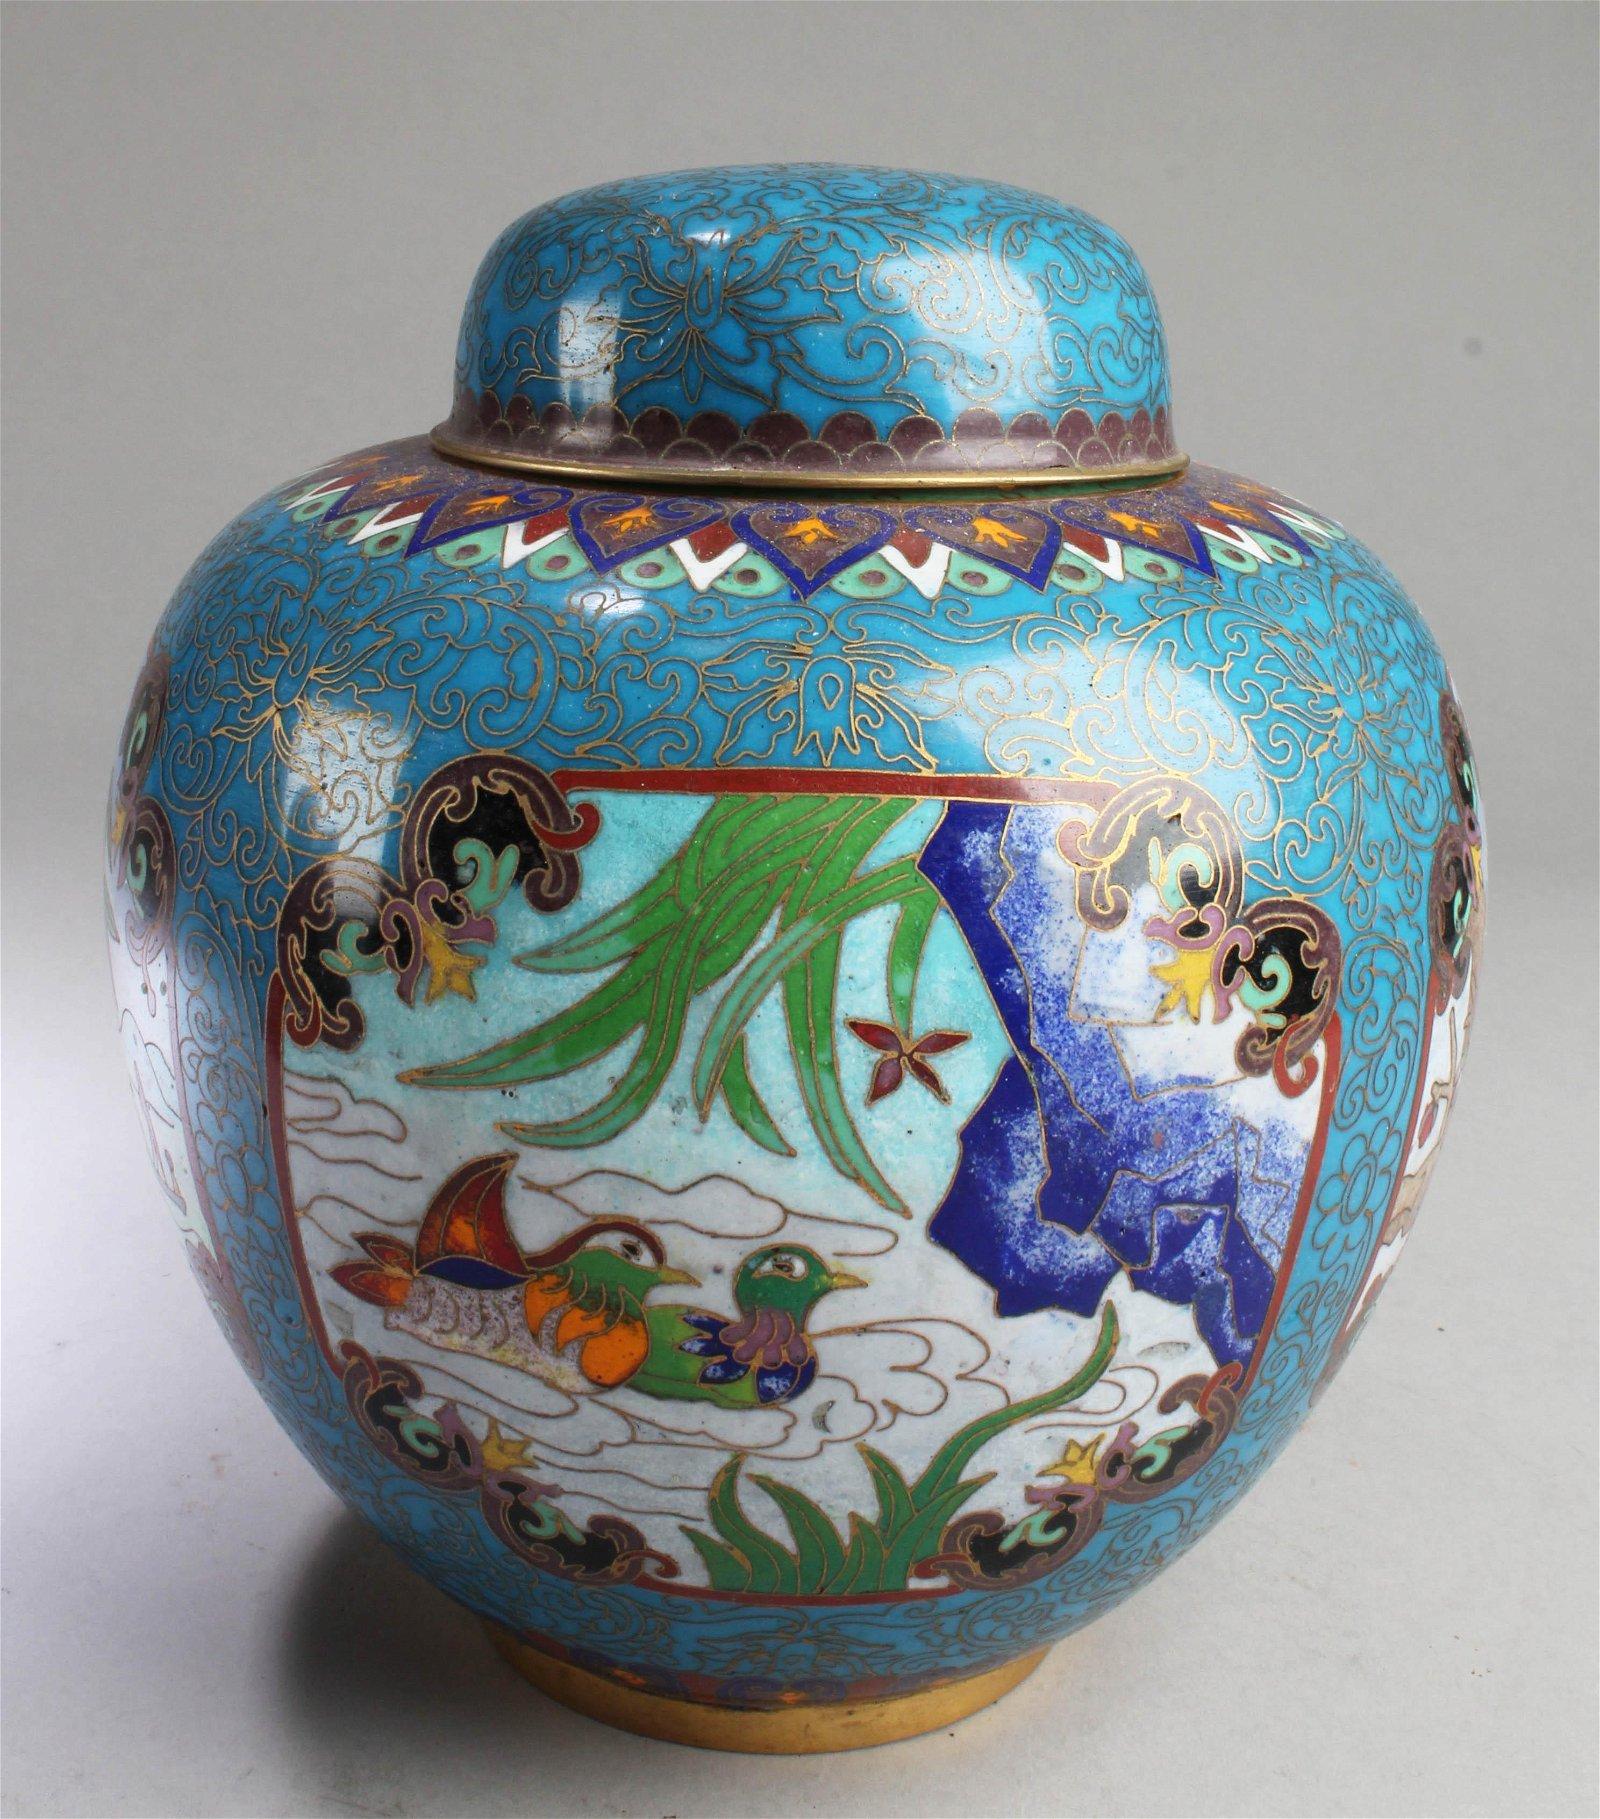 Antique Chinese Cloisonne Jar